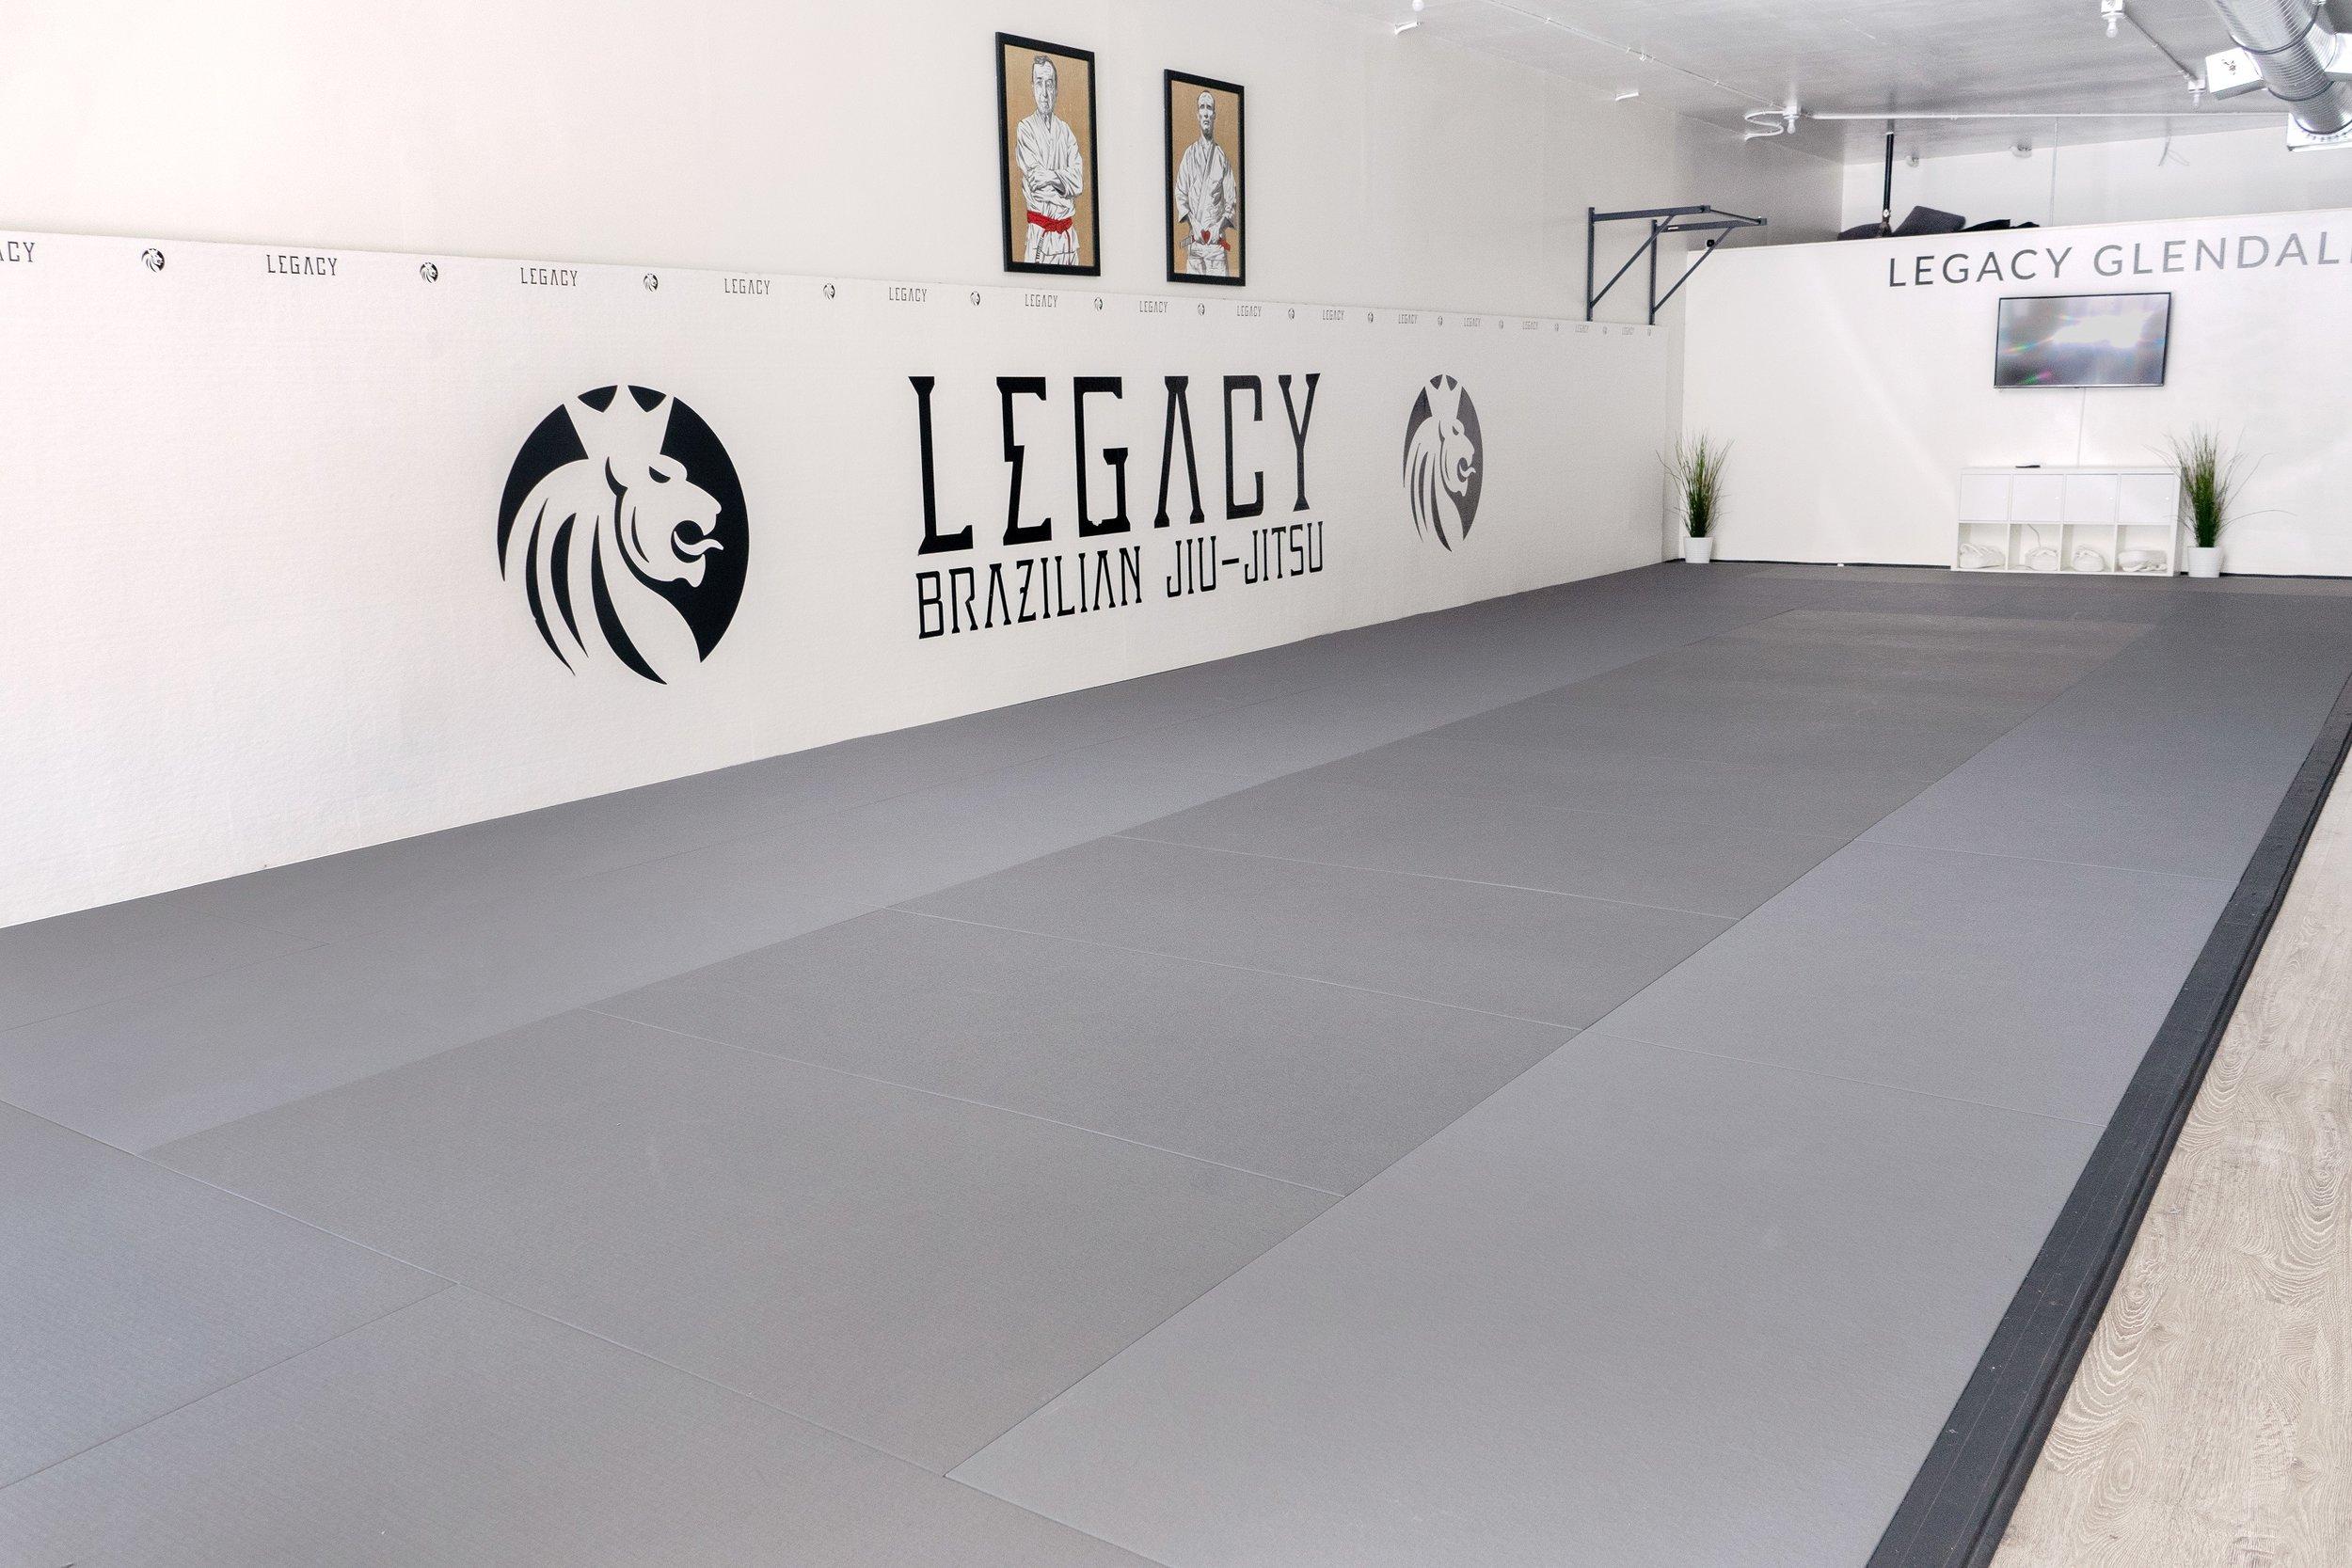 legacy-33.jpg